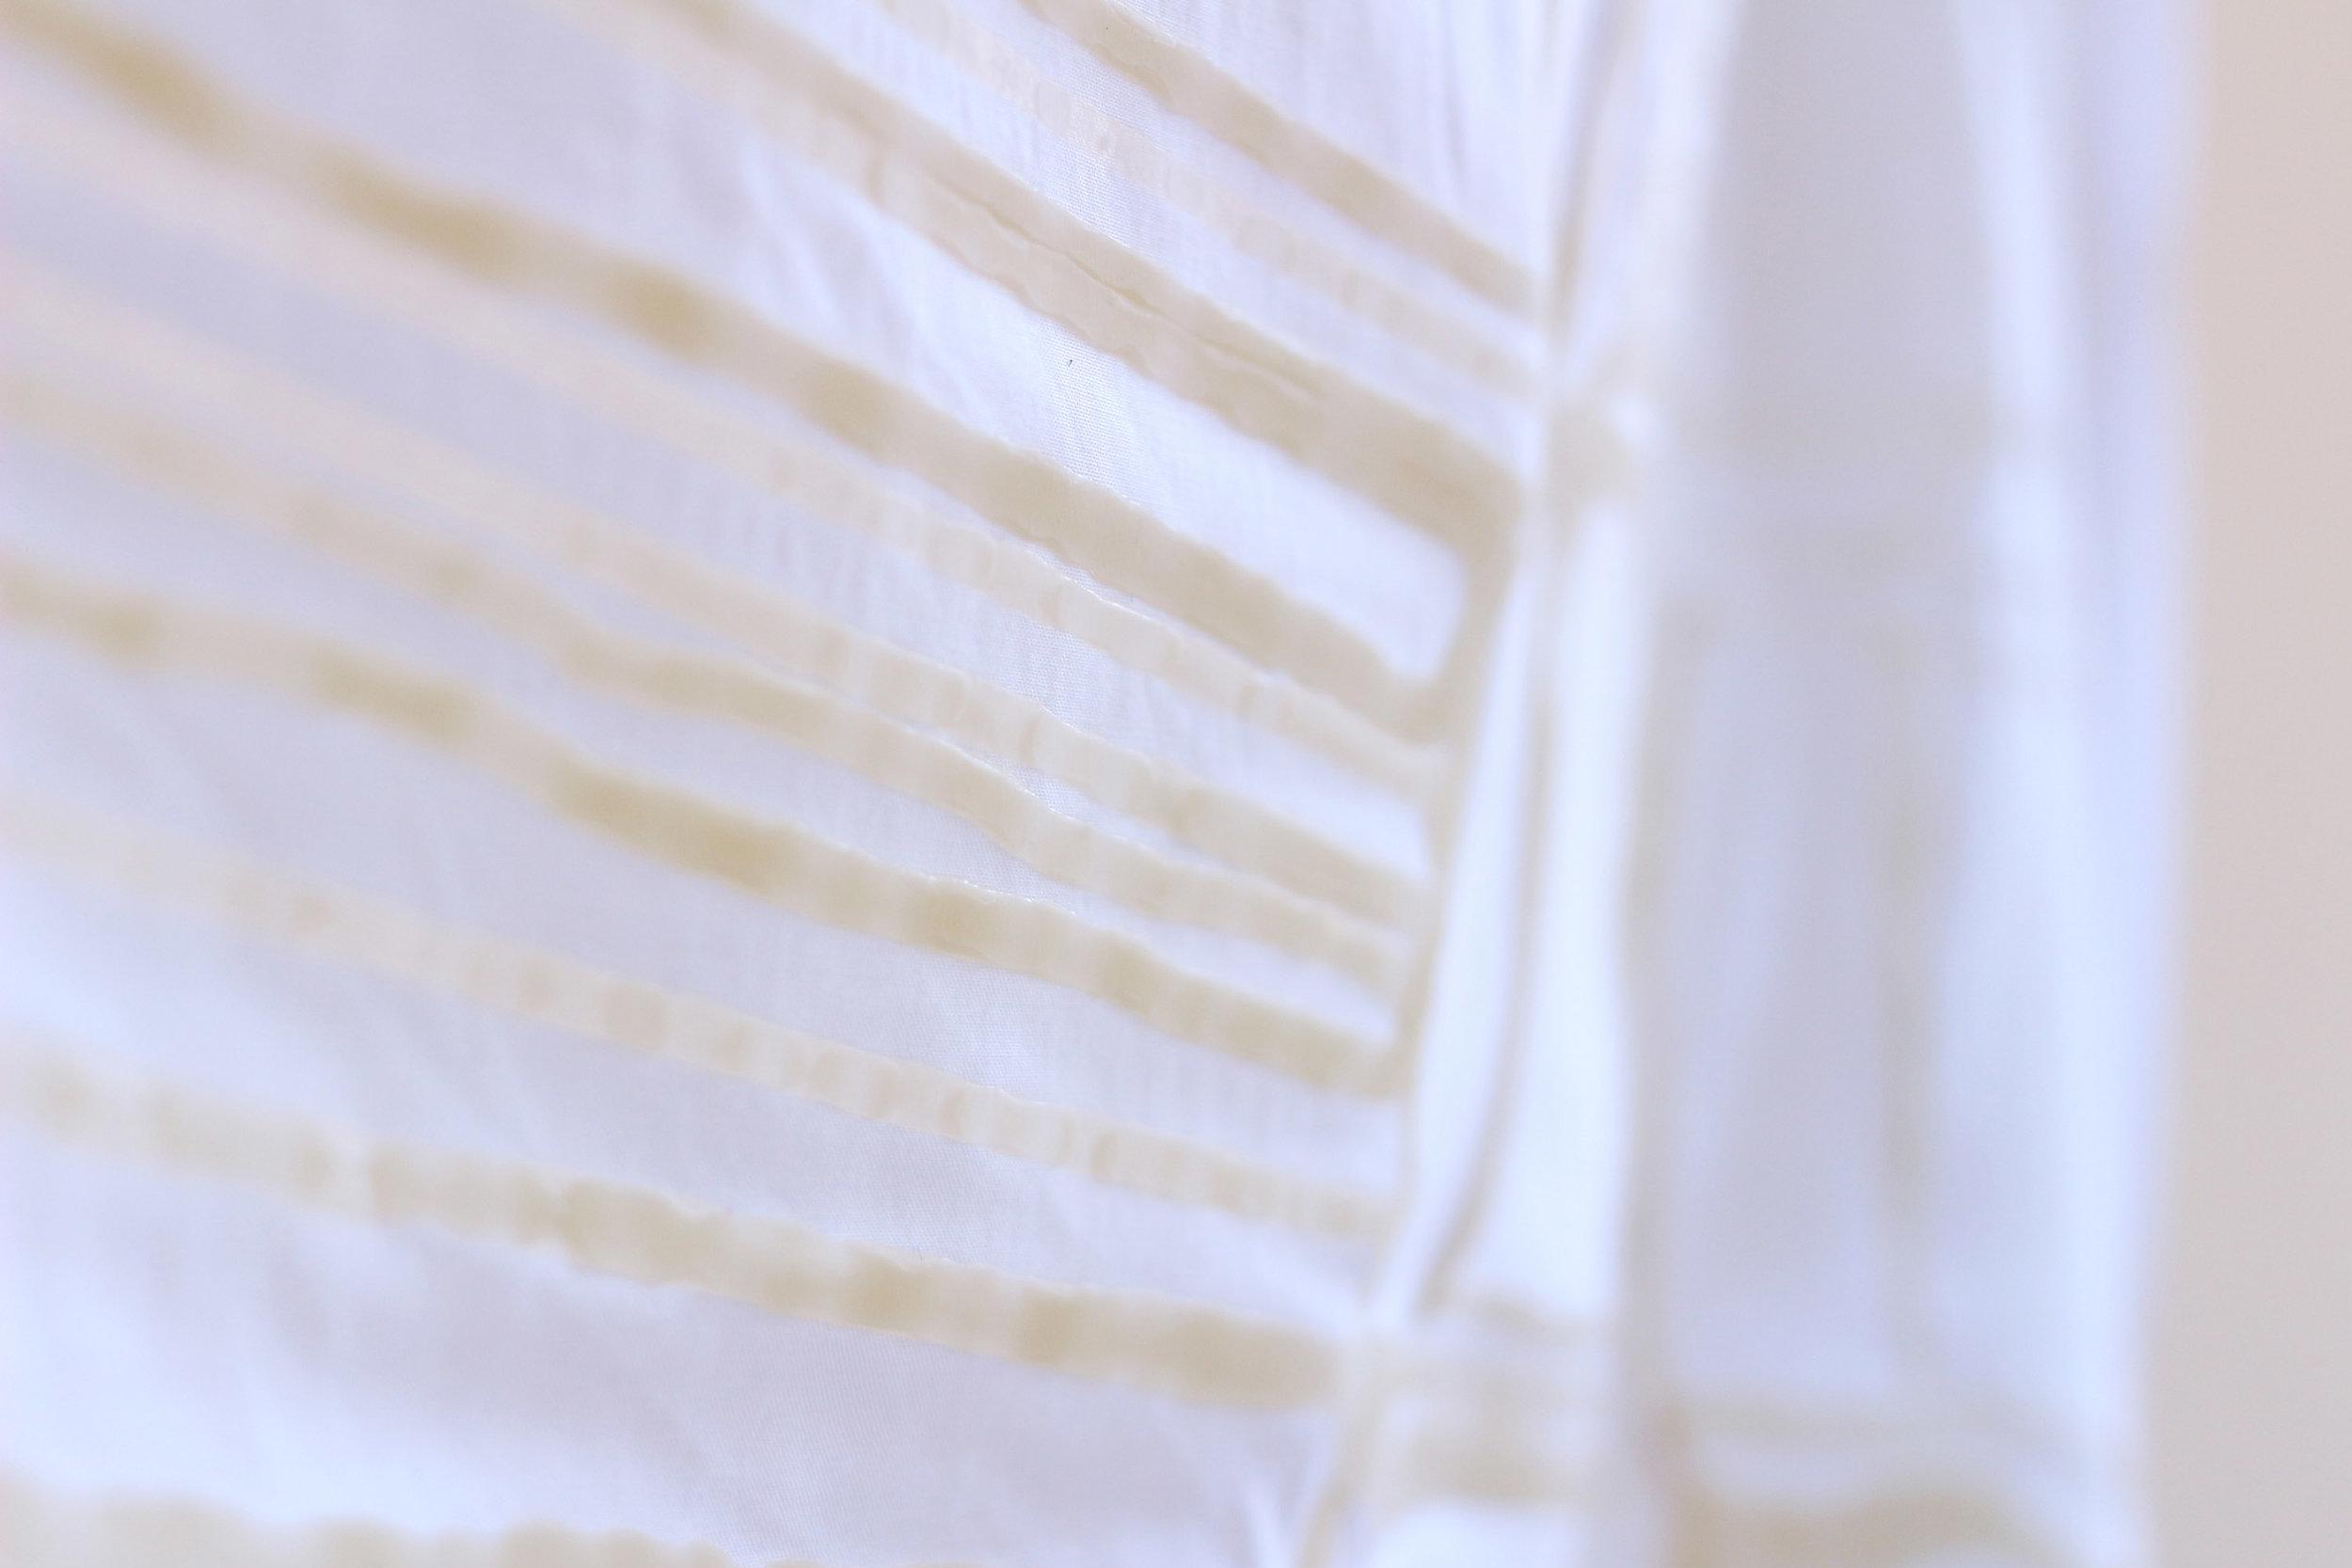 Textile 6.jpg